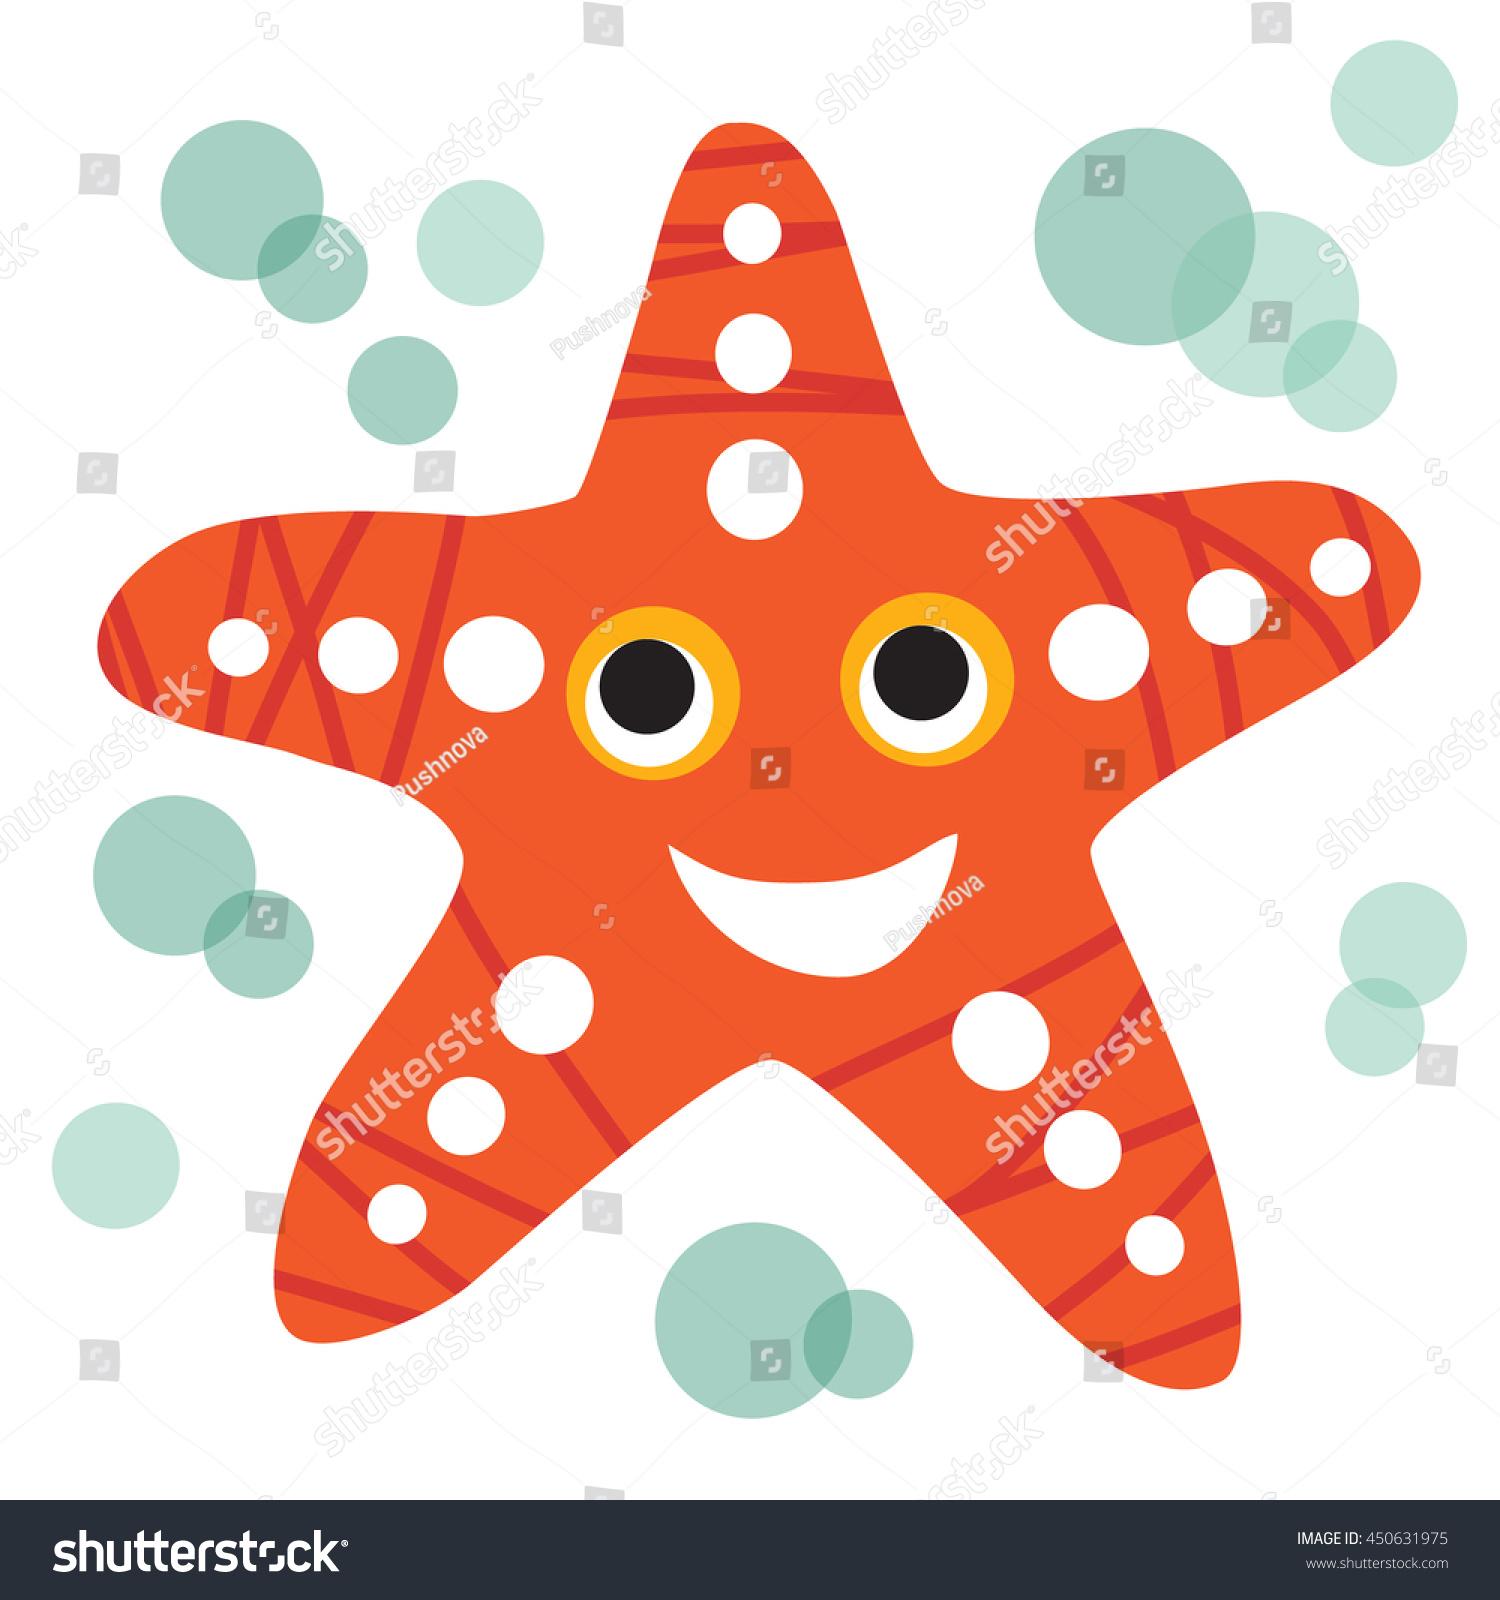 Illustration Cute Smiling Starfish Vector Format Stock Vector ...